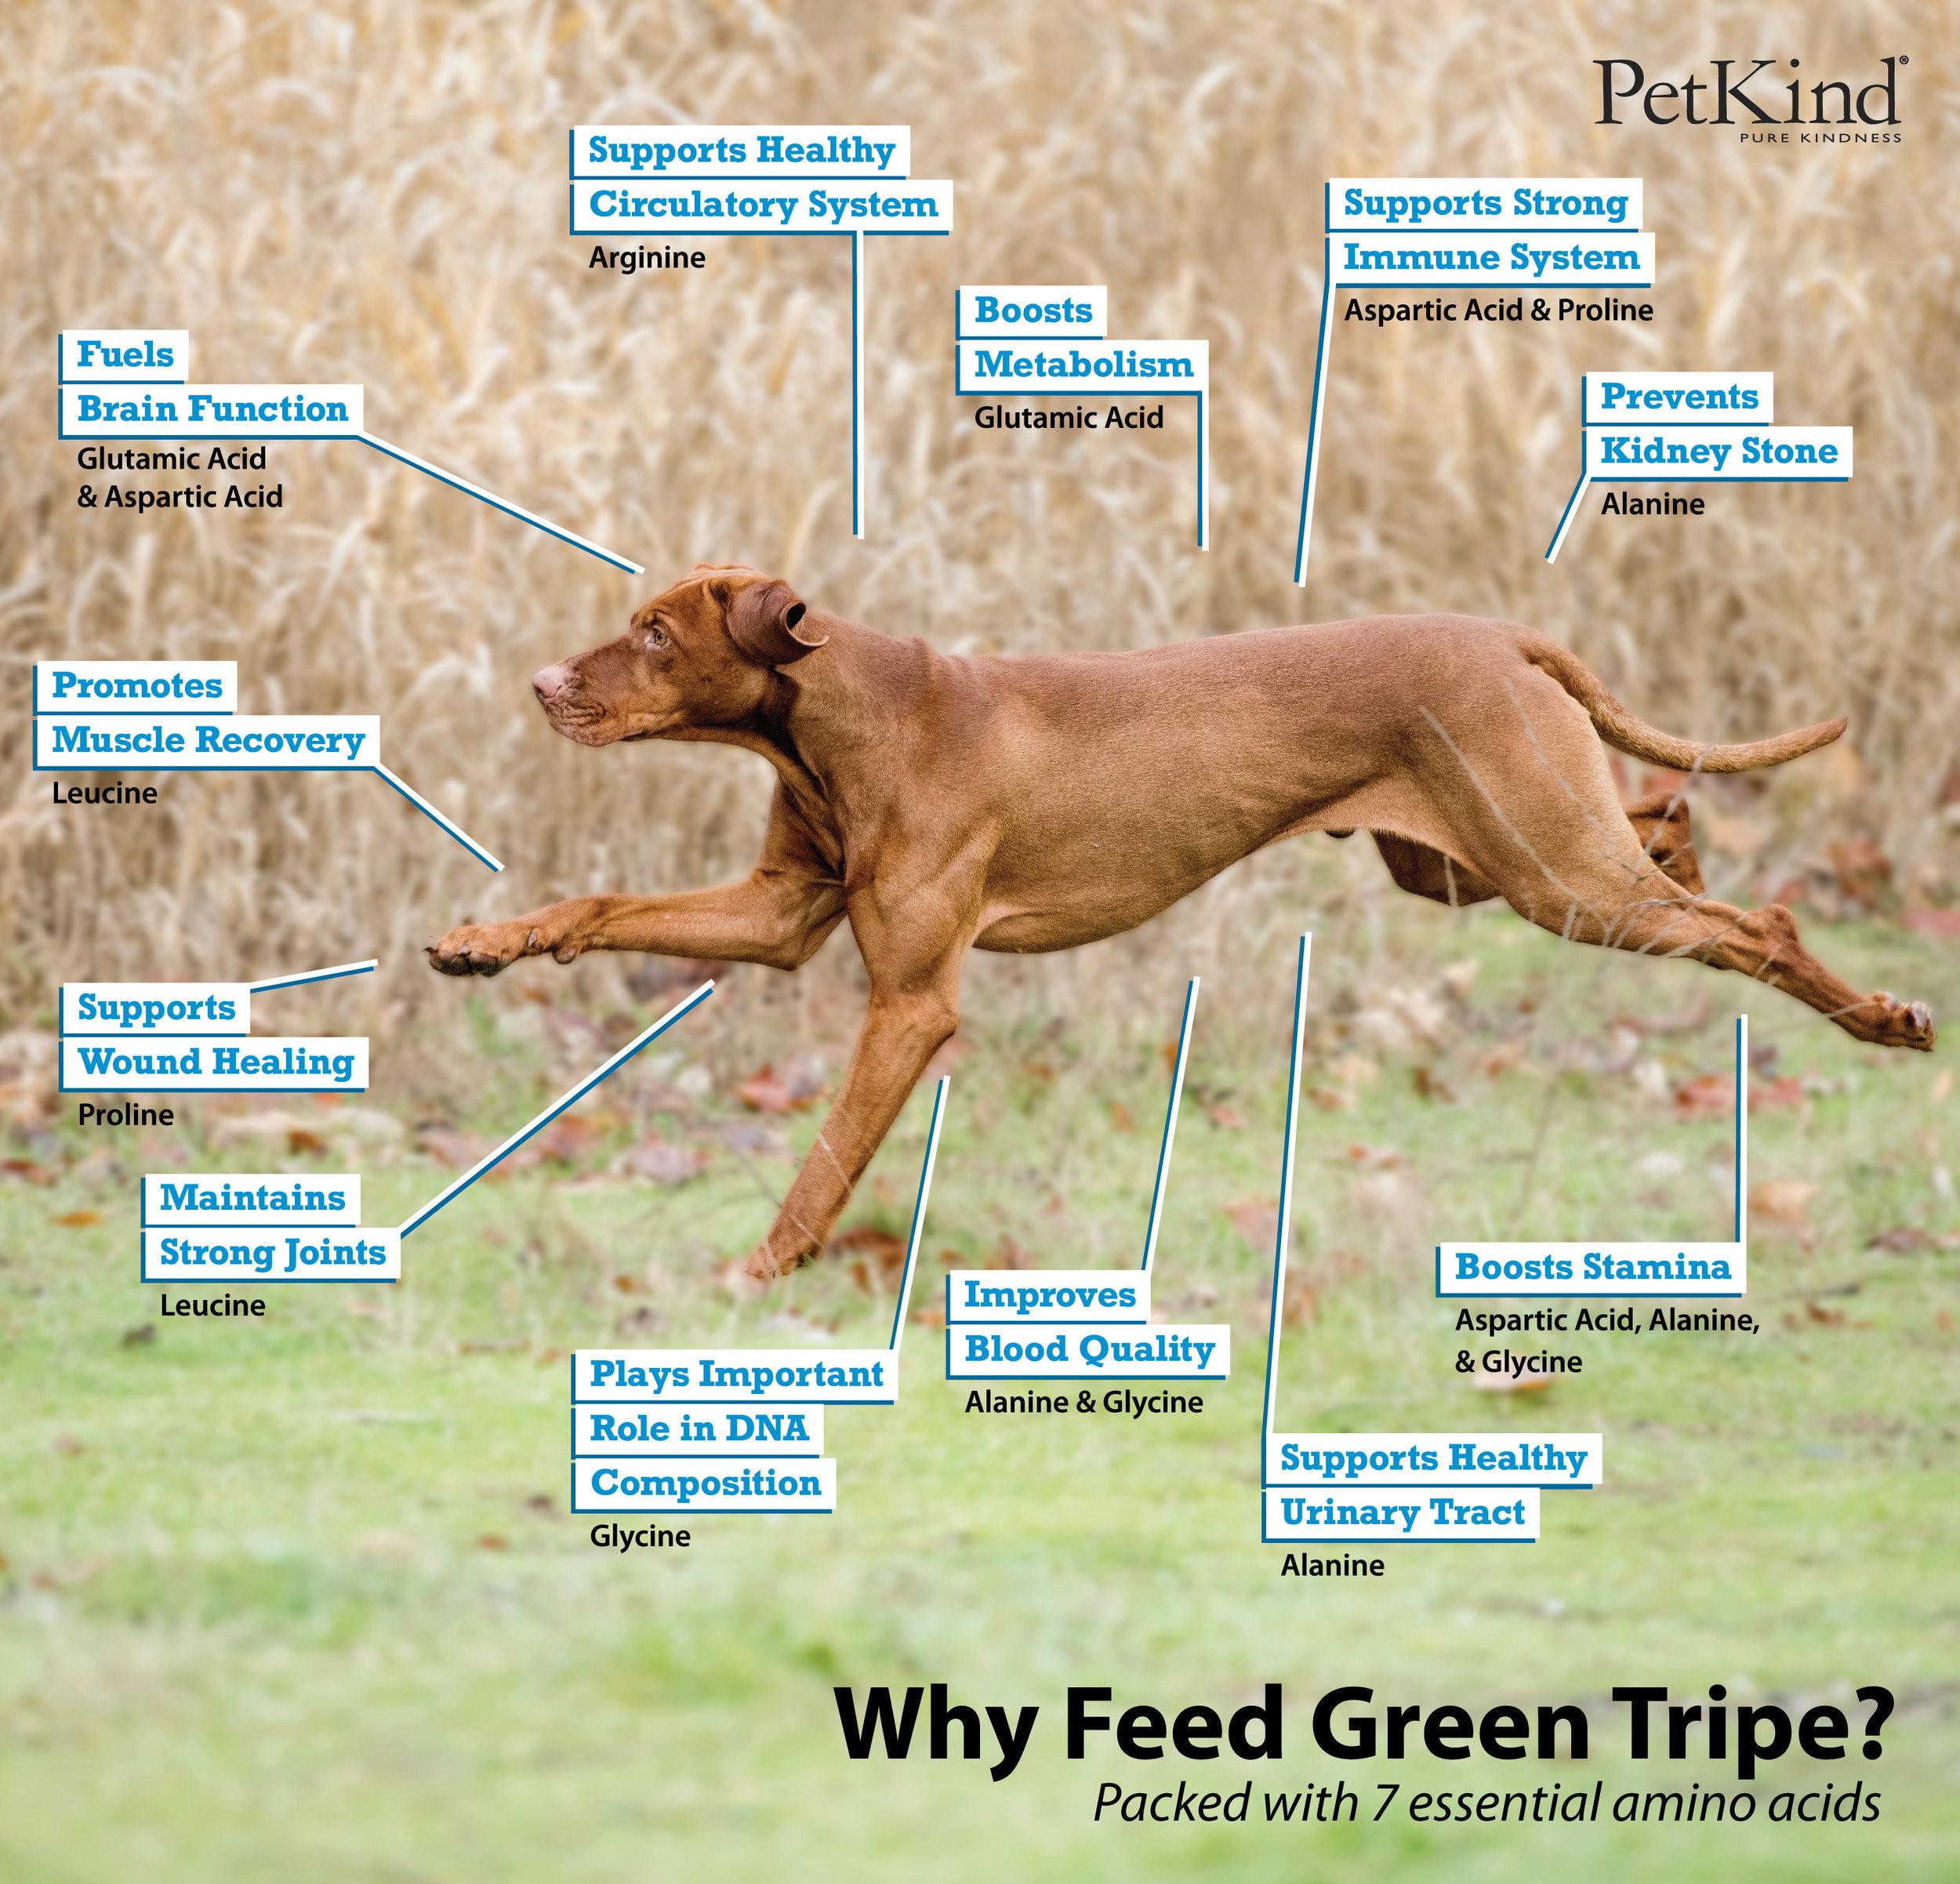 Green-Tripe-Infographic-(1).jpg